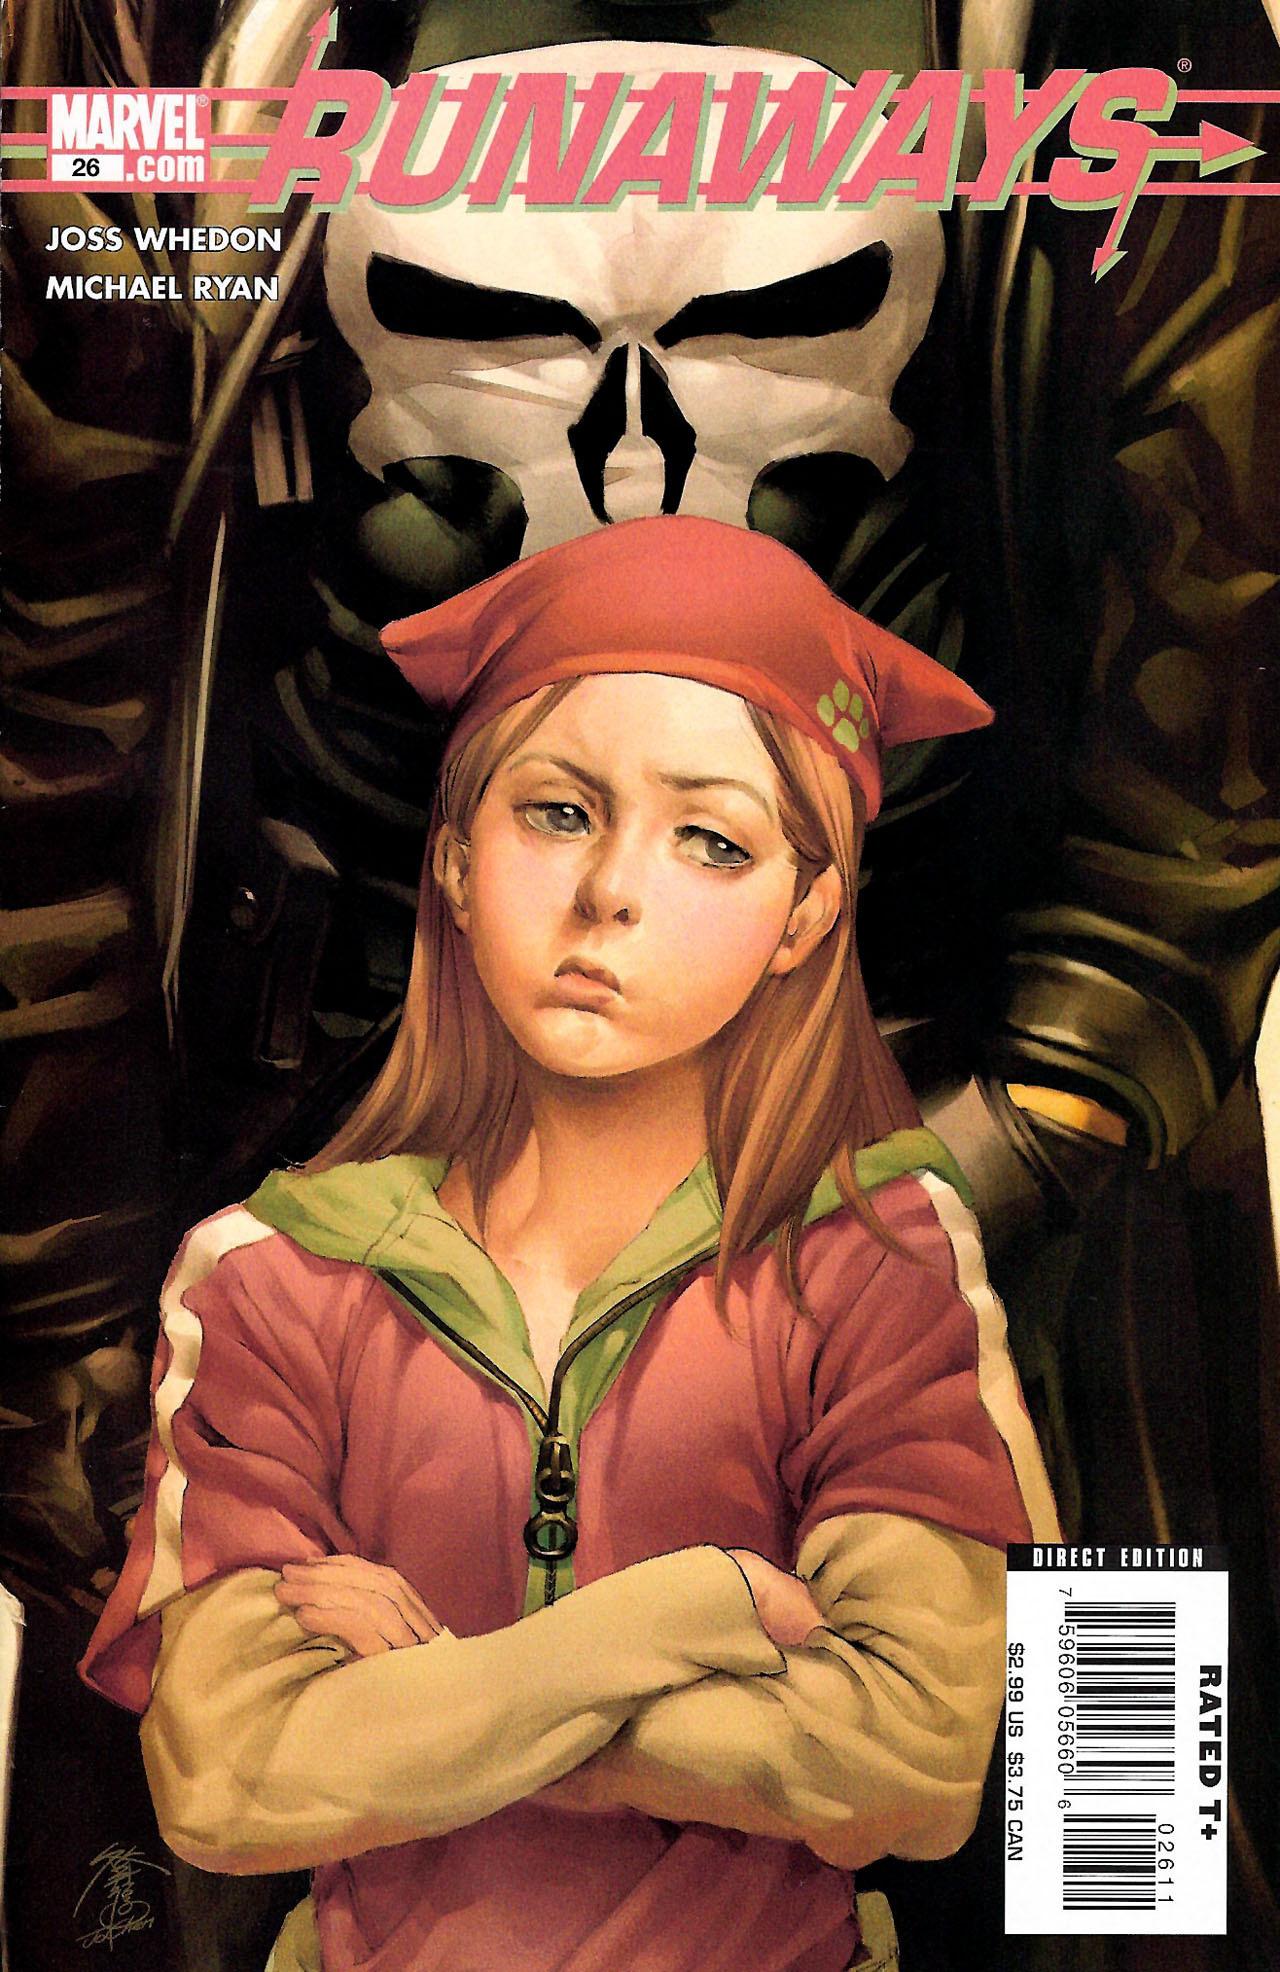 Download Wallpaper Marvel Runaways - Volume-2-Covers-the-runaways-comics-22113870-1280-1972  Image_403310.jpg